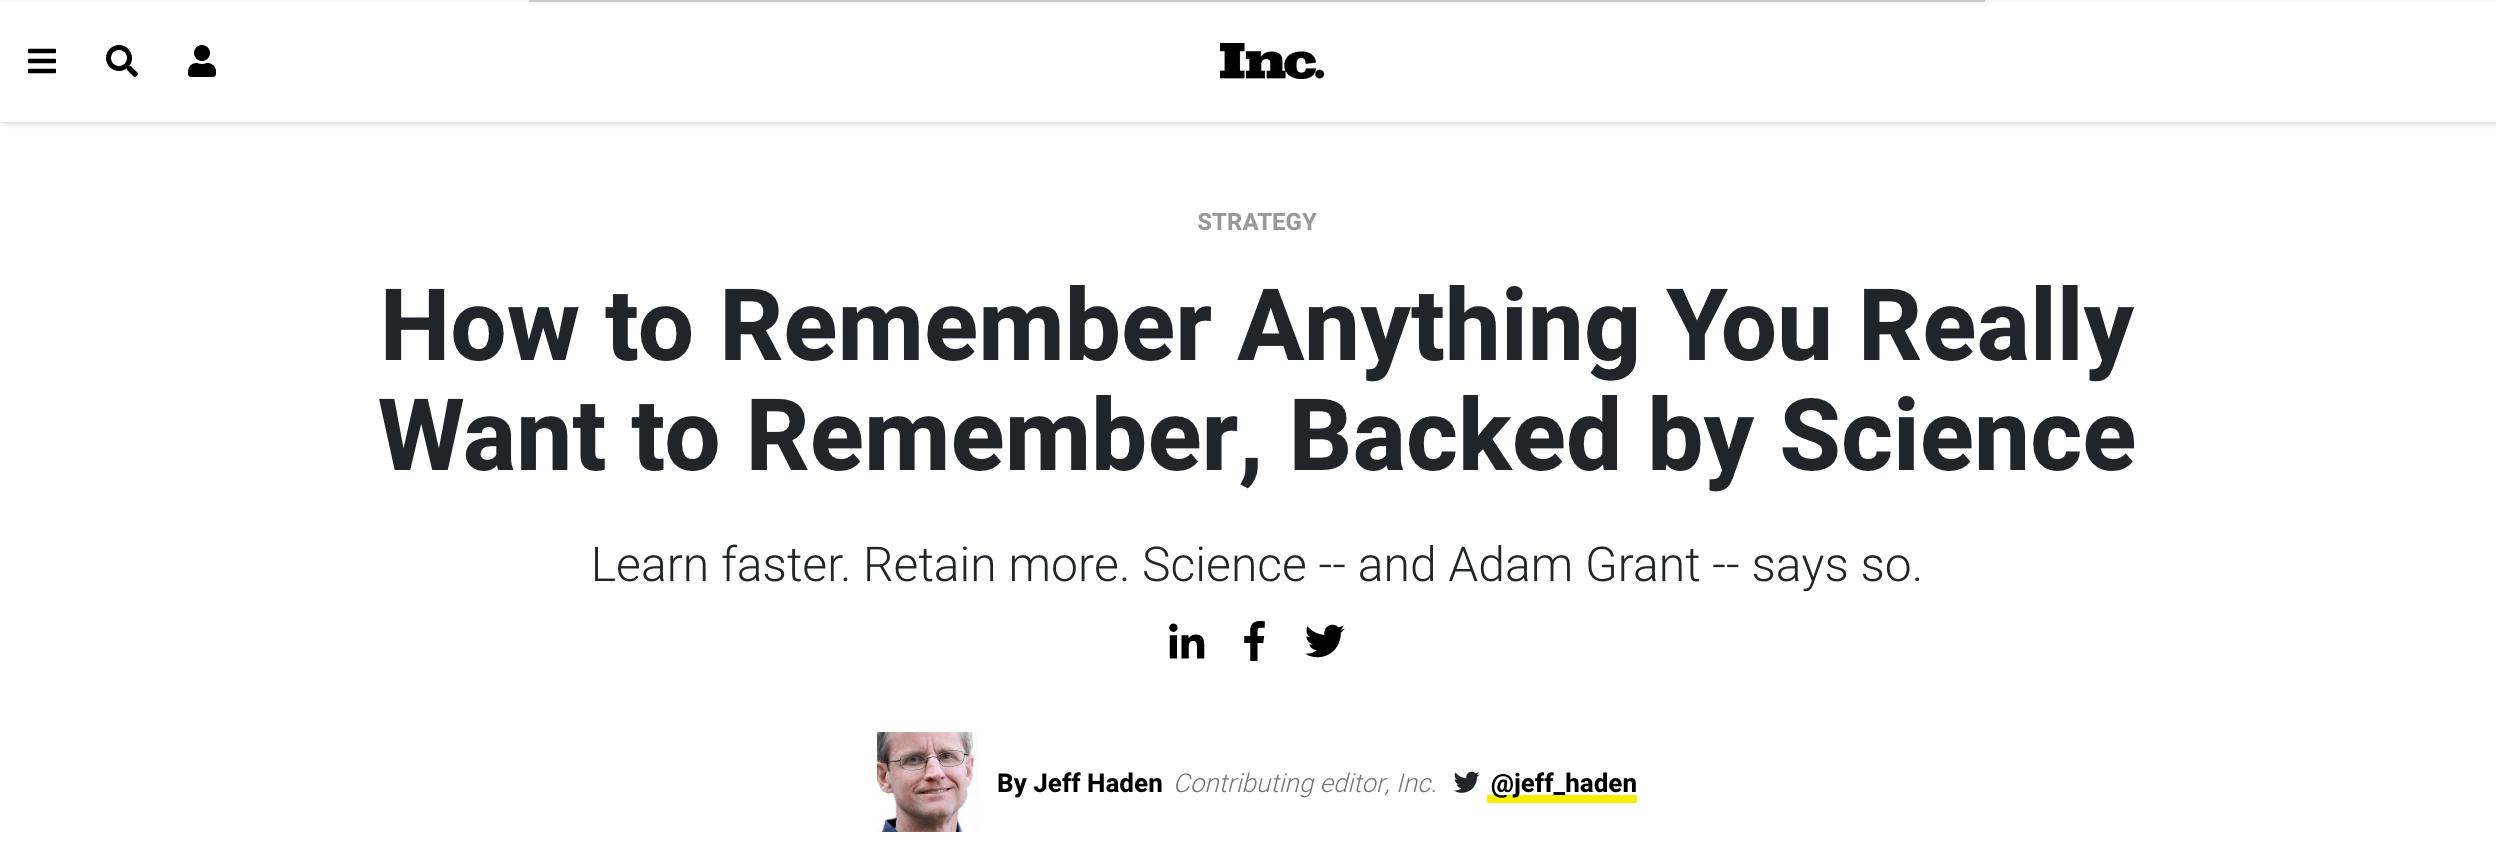 Inc effective headlines example